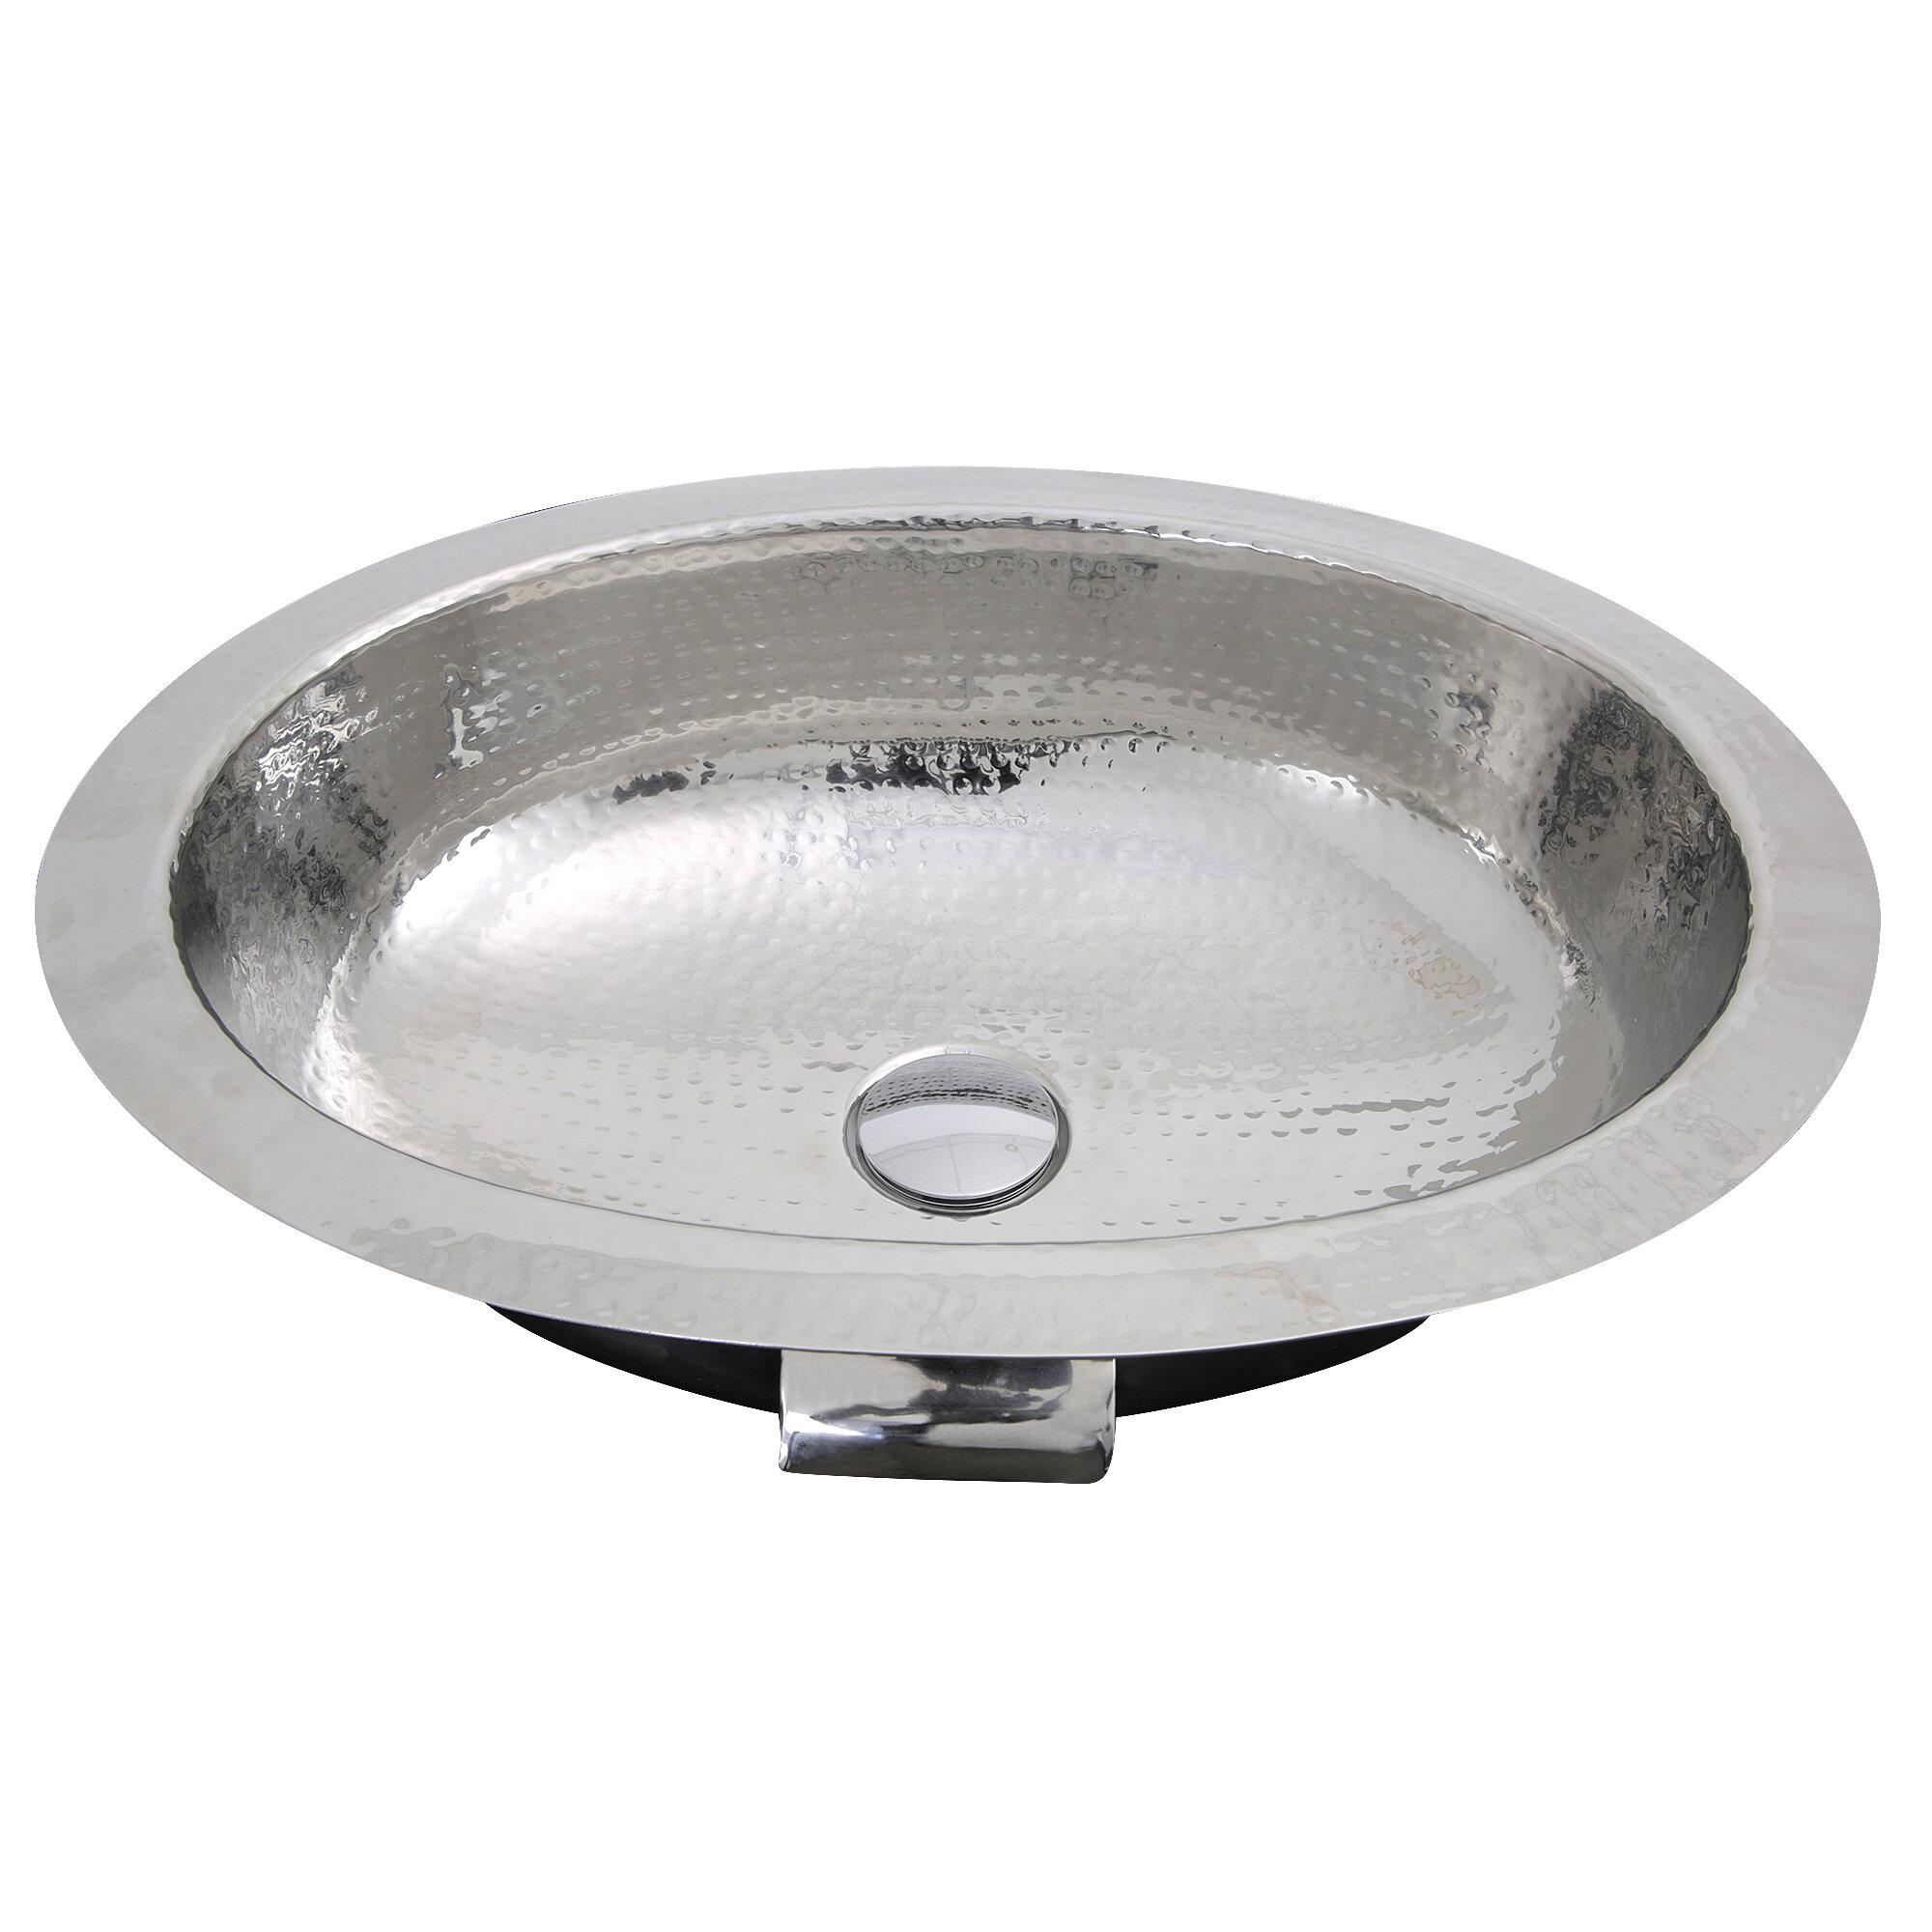 Nantucket Sinks Hand Hammered Stainless Steel Oval Undermount Bathroom Sink With Overflow Wayfair